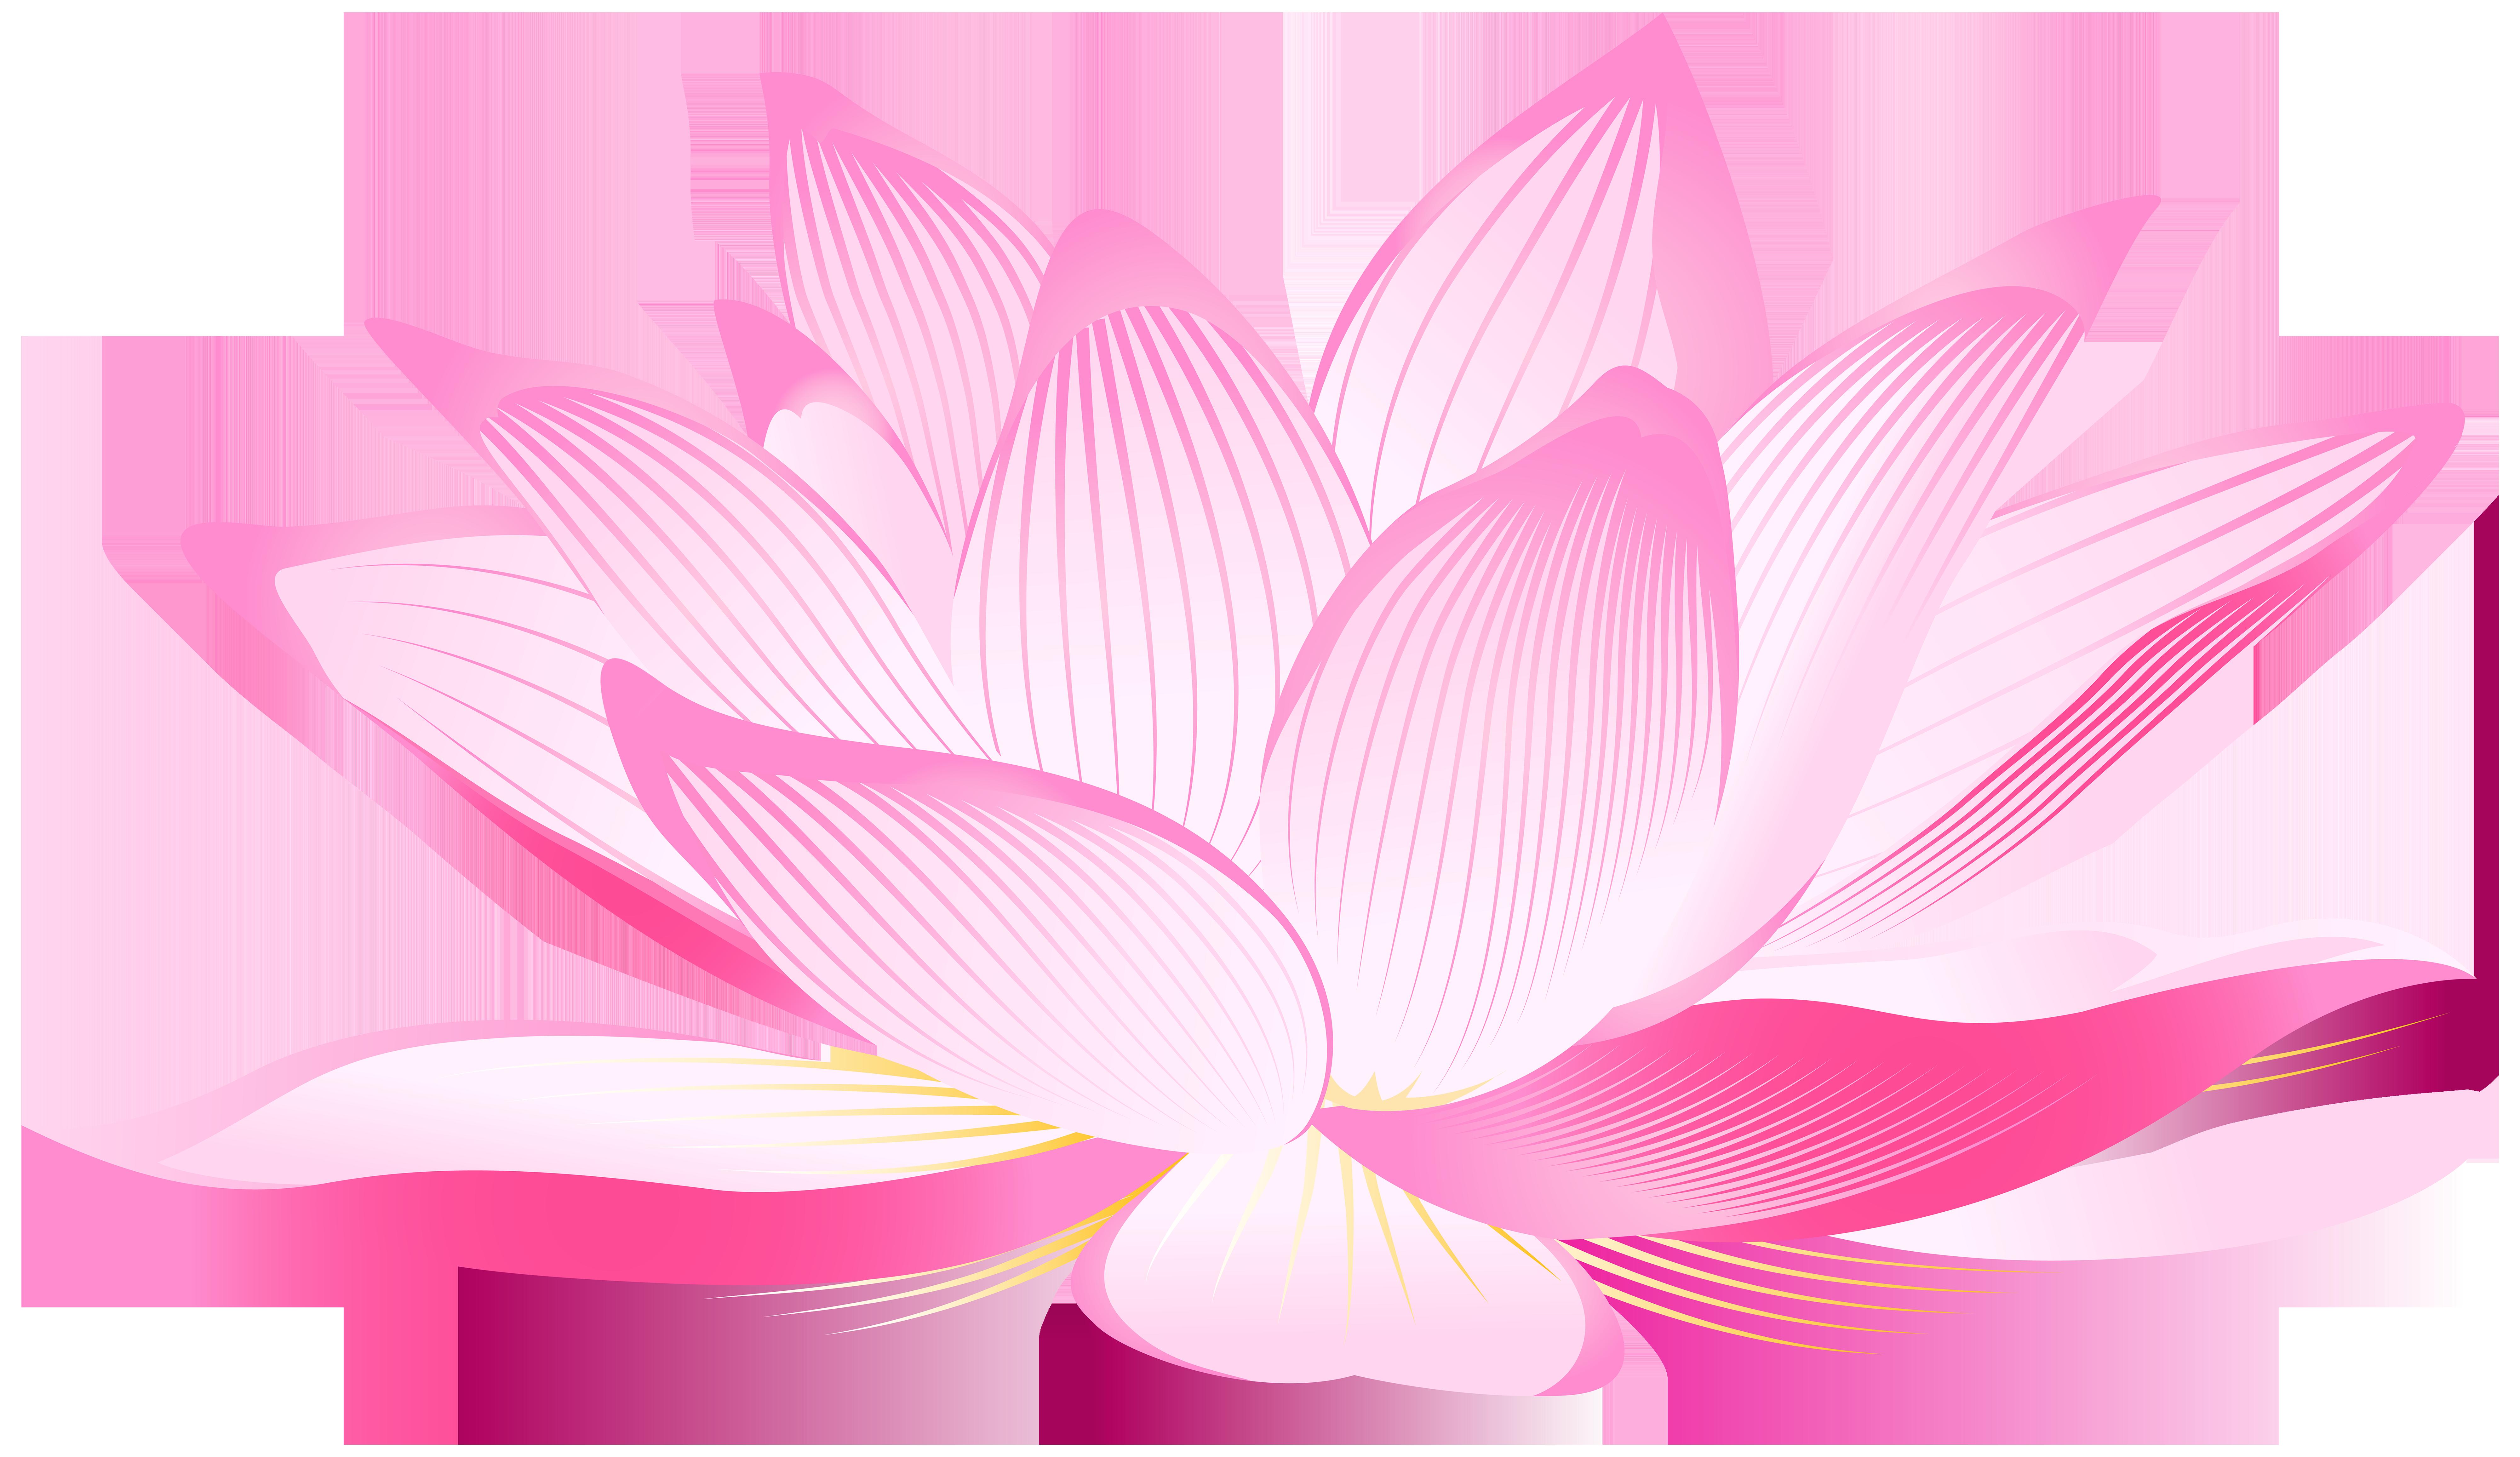 Nelumbo nucifera aquatic plants. Lotus clipart lotus plant